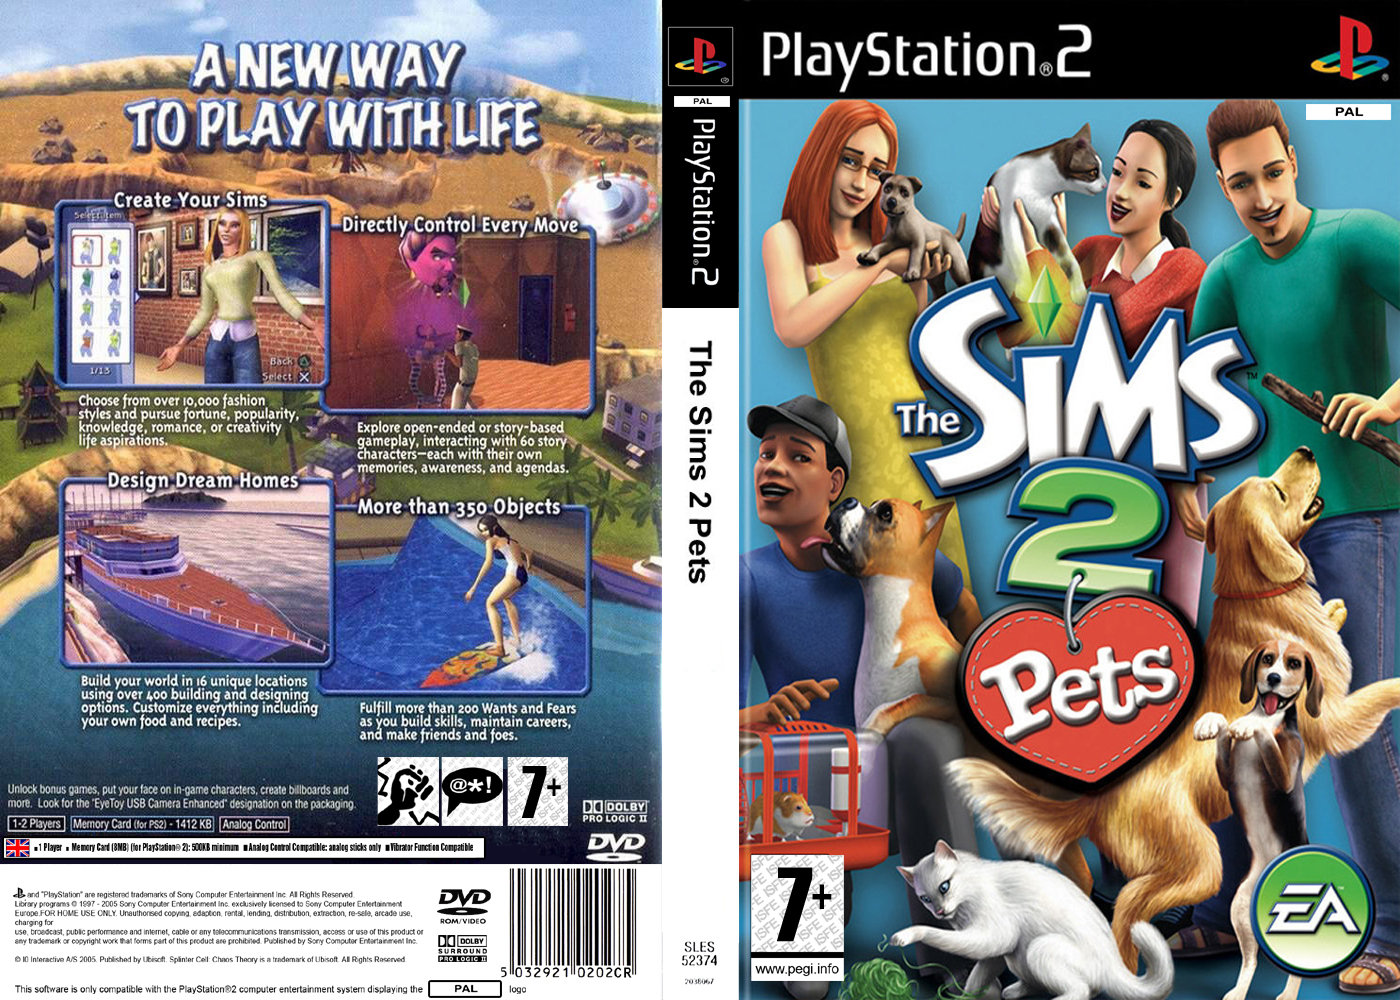 The sims 2: pets the sims 3: pets the sims 2: nightlife maxis.